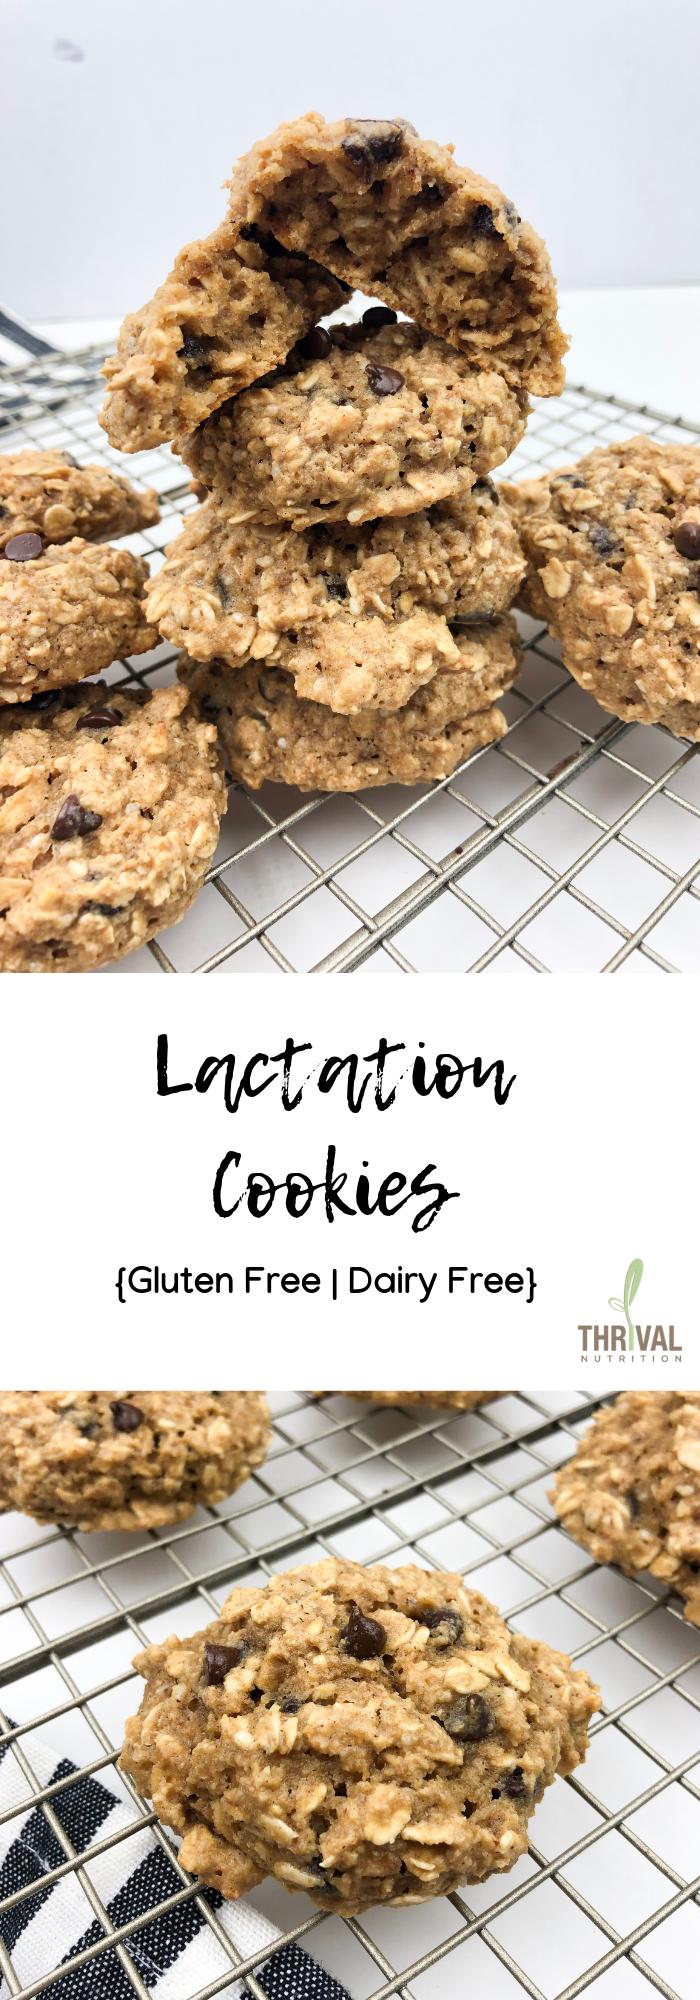 Lactation Cookies Gluten Free Dairy Free Recipe Lactation Cookies Gluten Free Cookies Healthy Lactation Cookies